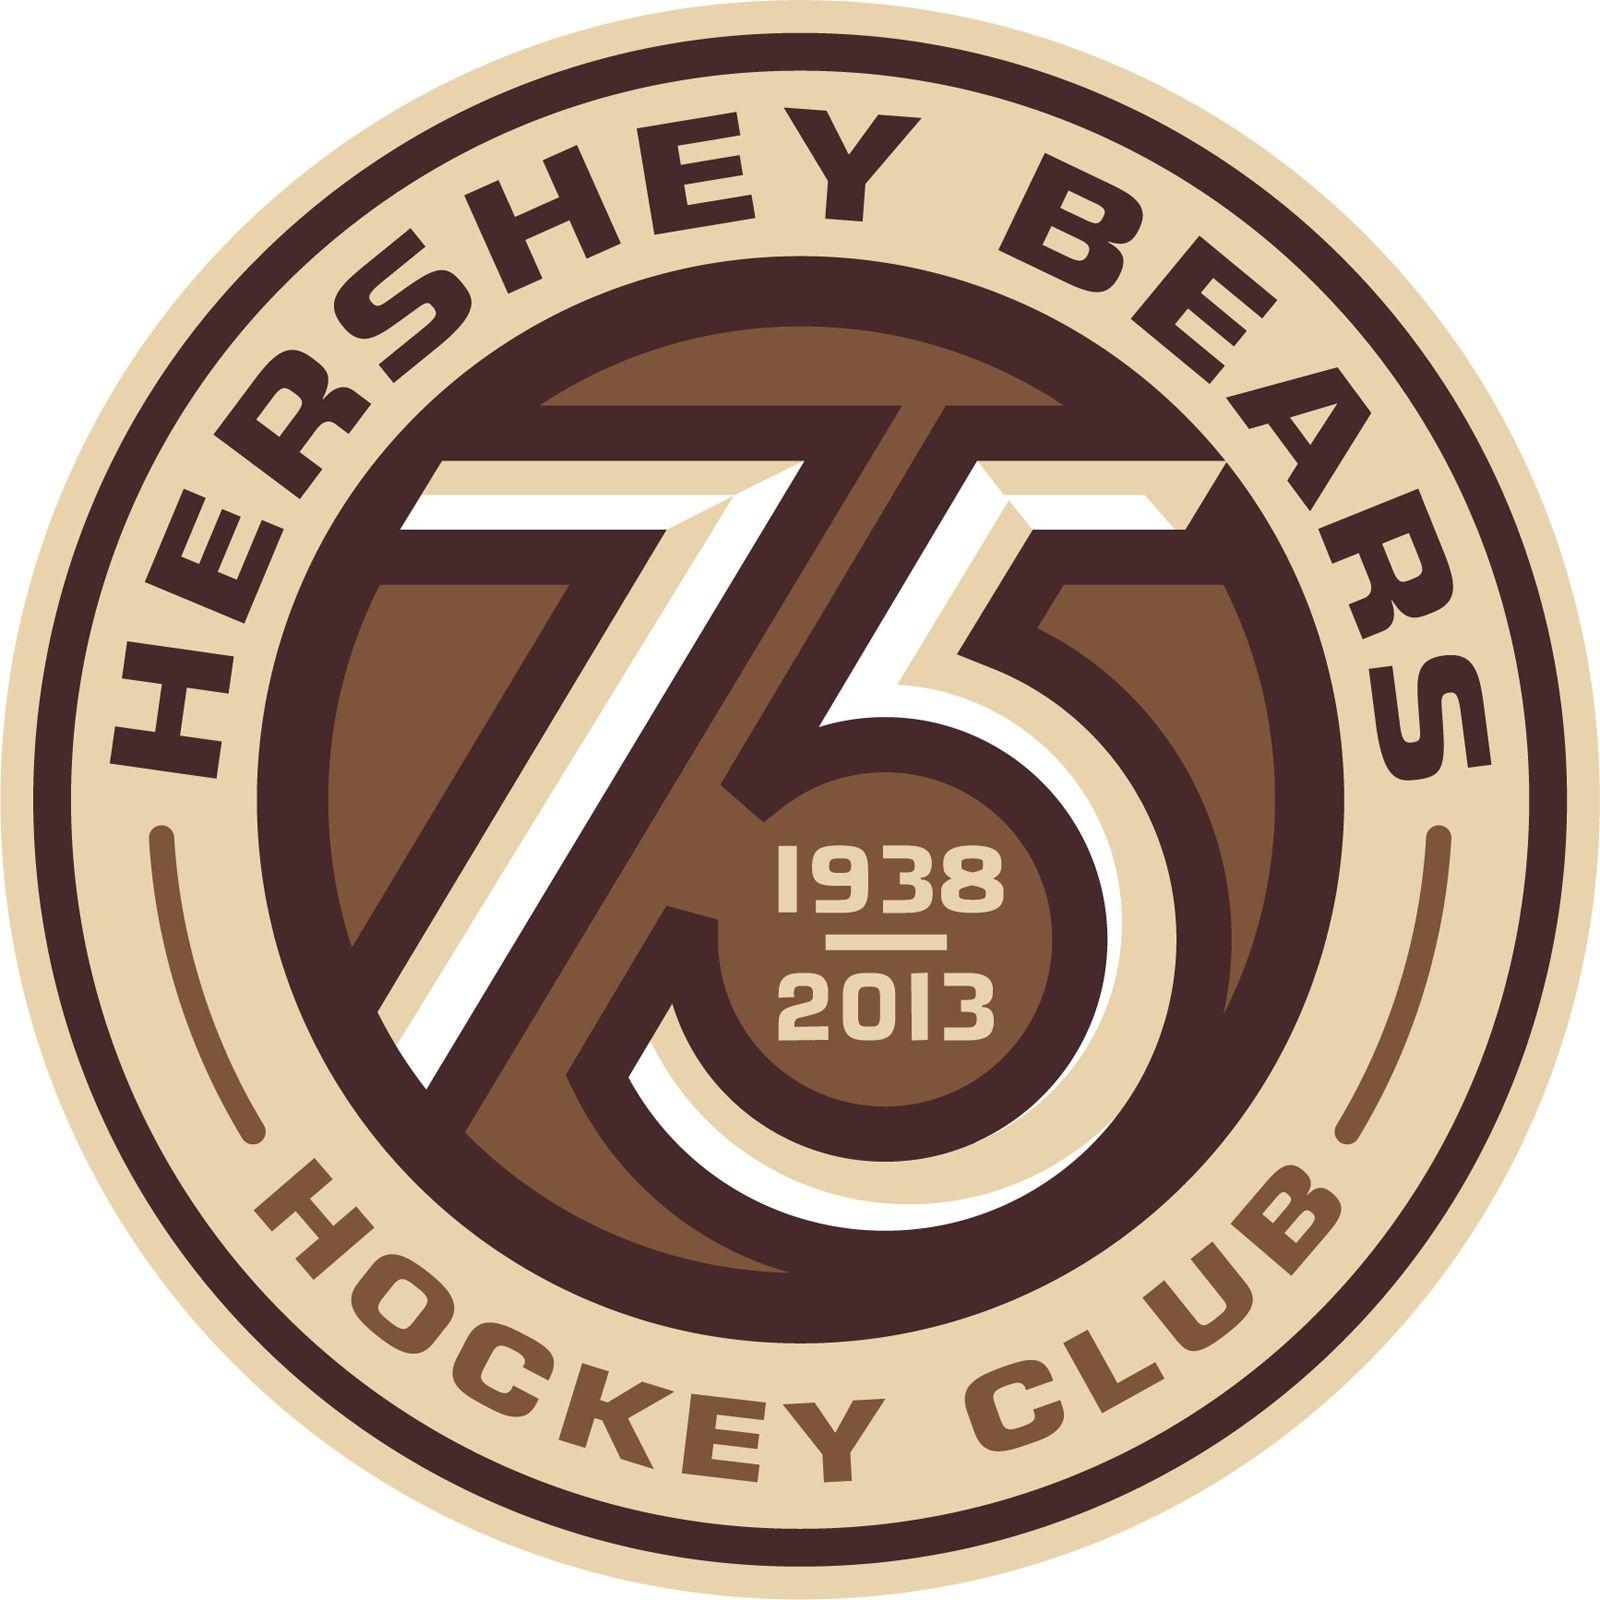 Celebrating Tradition And Excellence This Season In Hershey 75 Years Of Hershey Bears Hockey Hershey Bears Anniversary Logo Hockey Logos